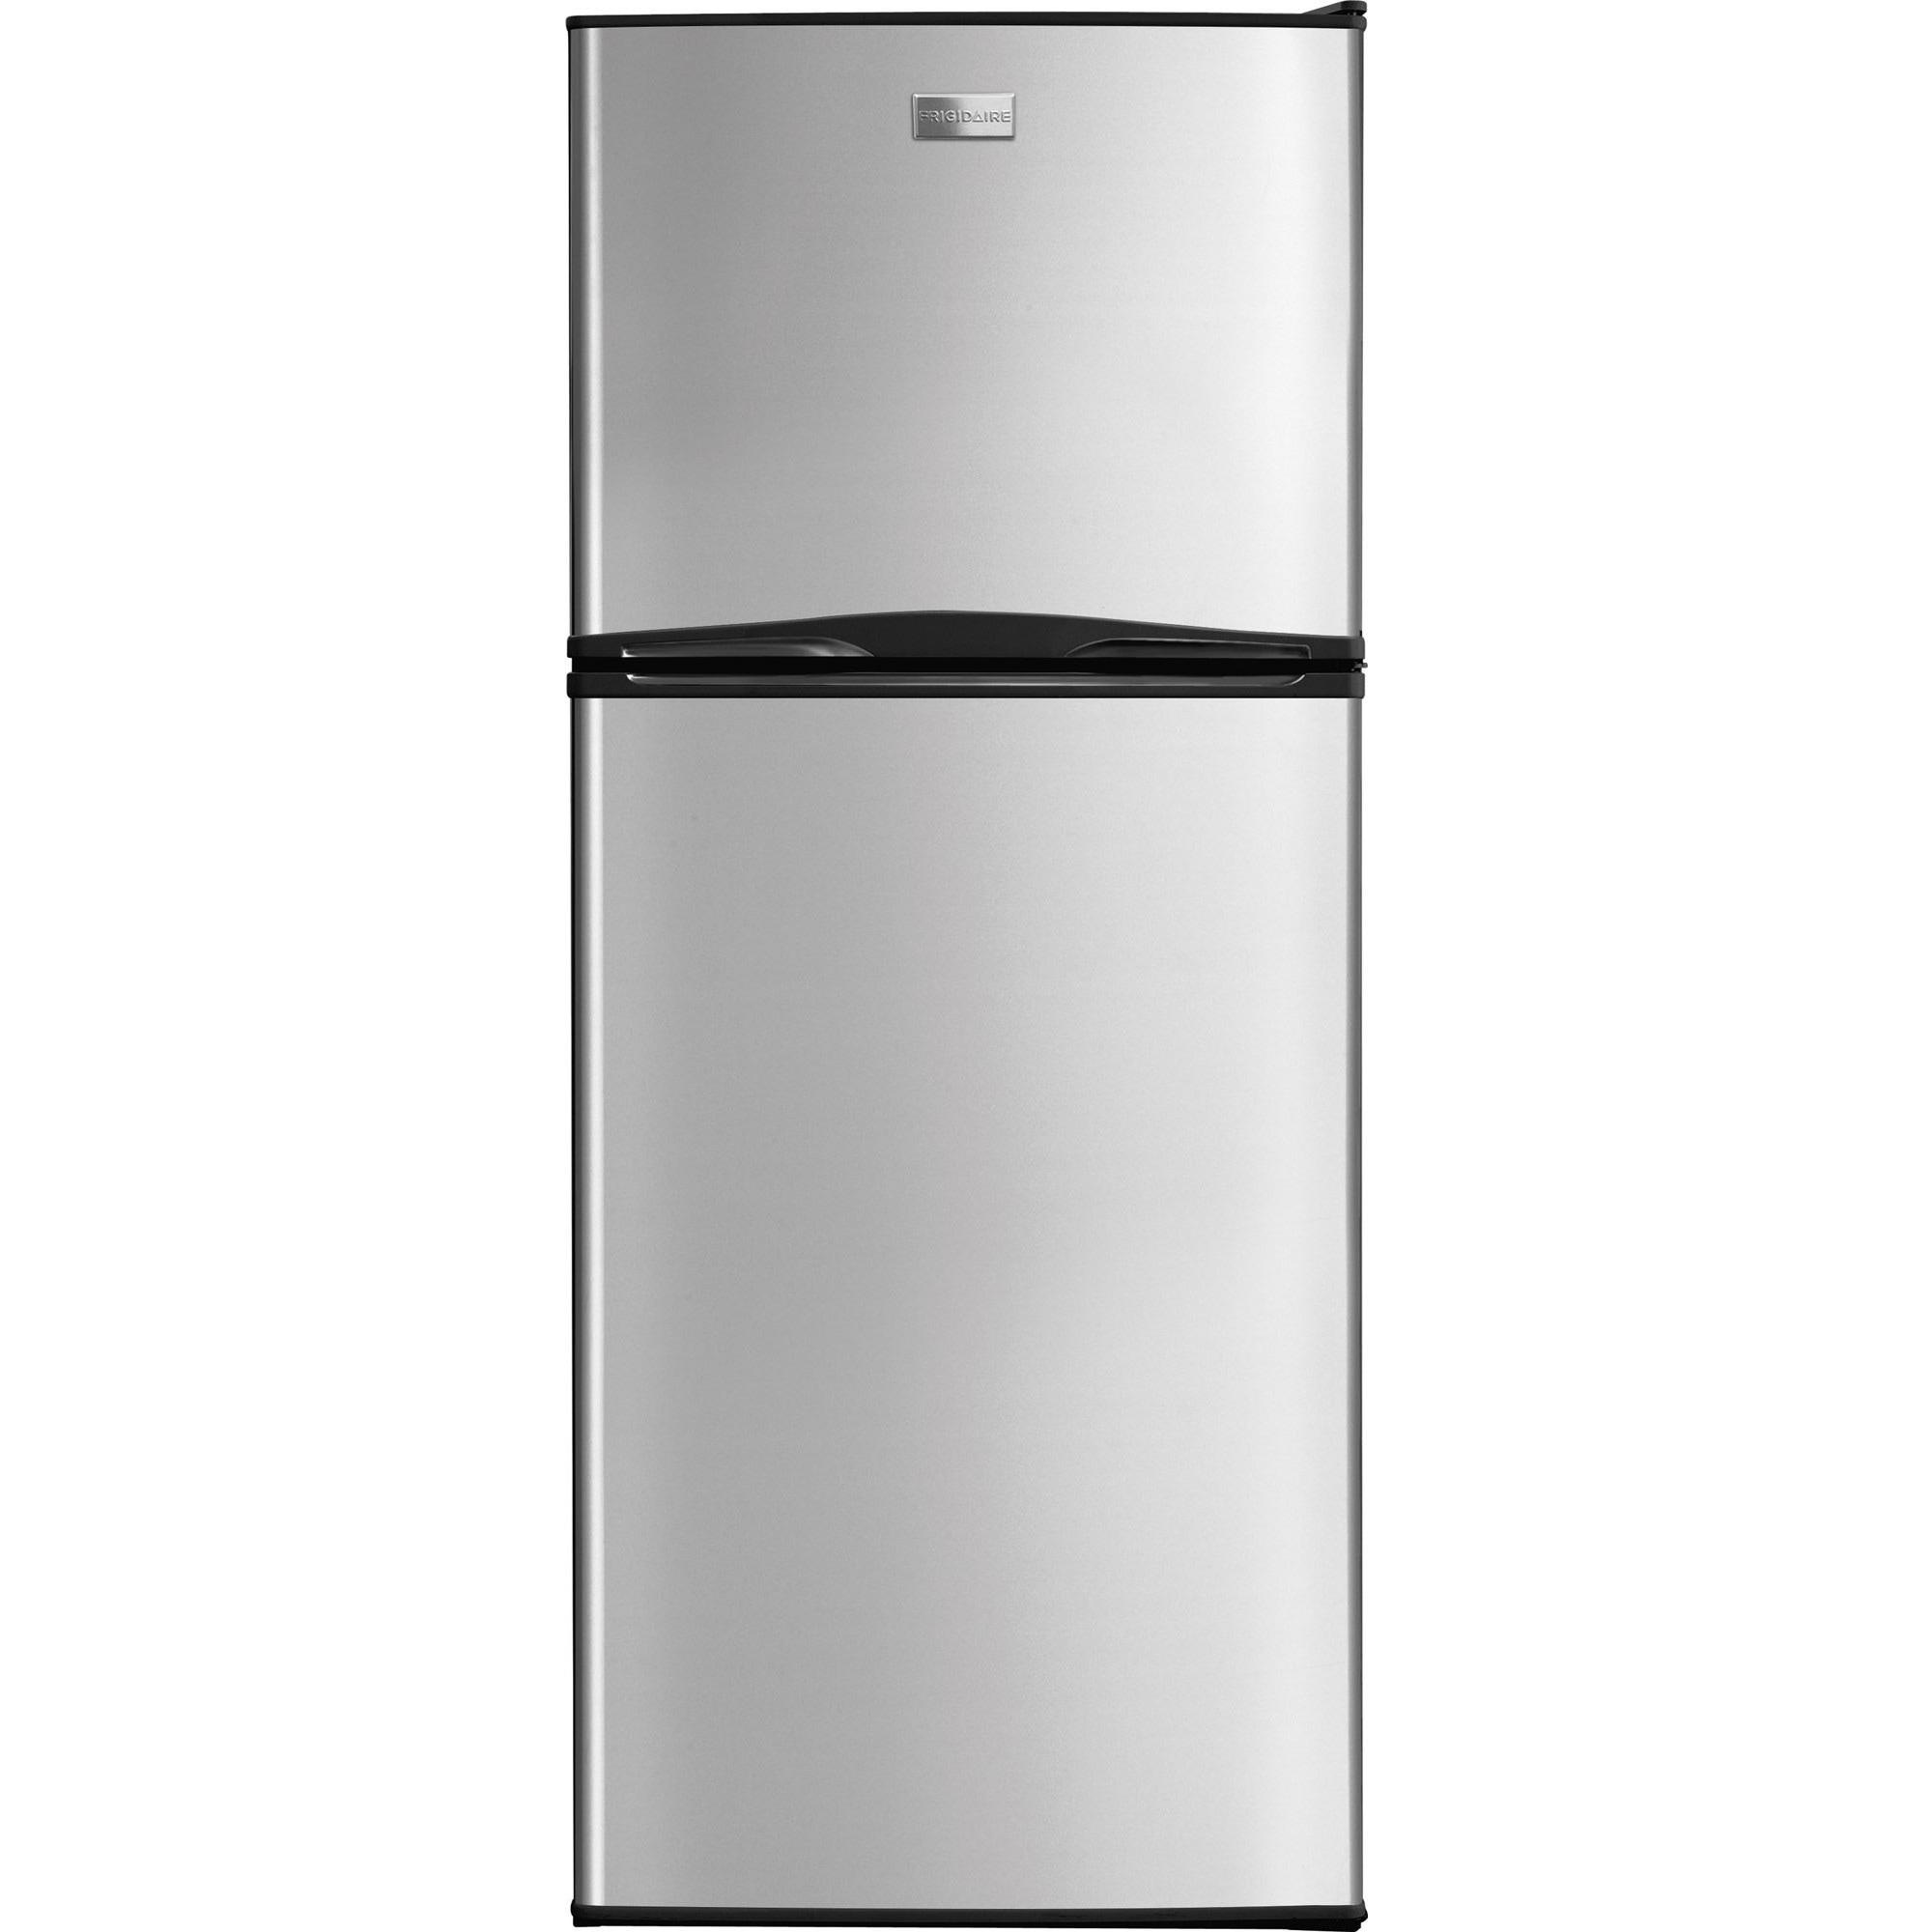 "Frigidaire FFET1222QS 24"" Apartment Size Top-Freezer Refr..."